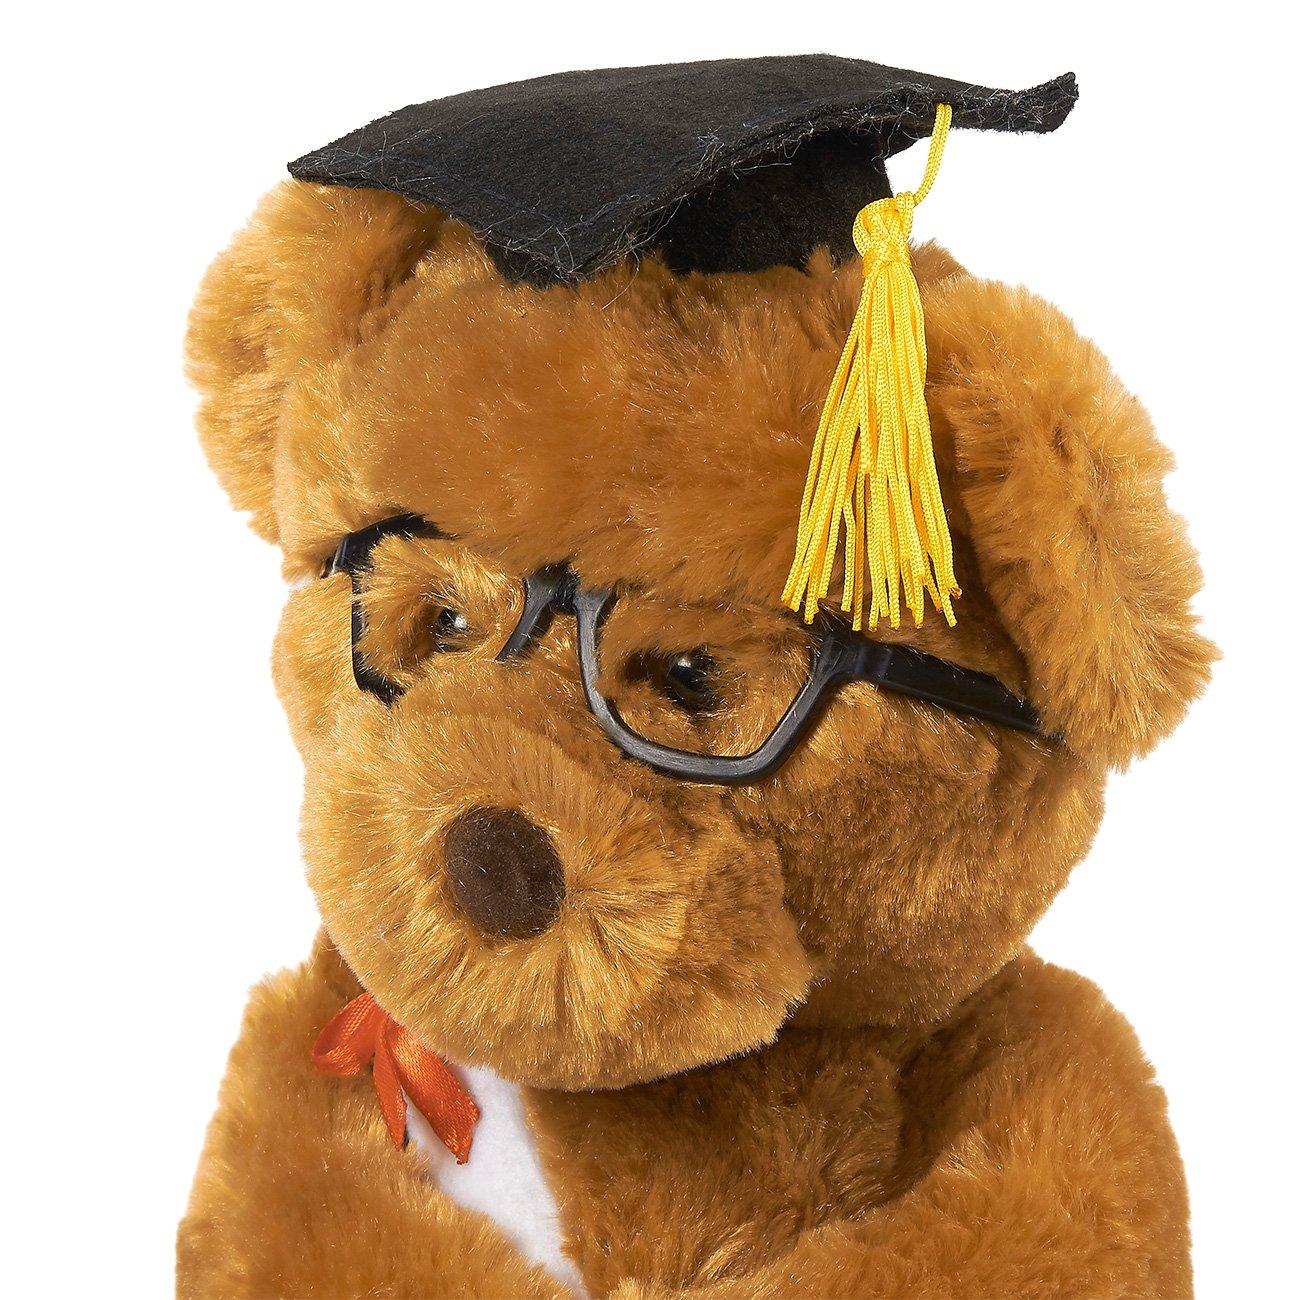 66ddbf3fc39 Amazon.com  Blue Panda Graduation Plush Bear - Stuffed Animal Louie The Teddy  Bear with Glasses